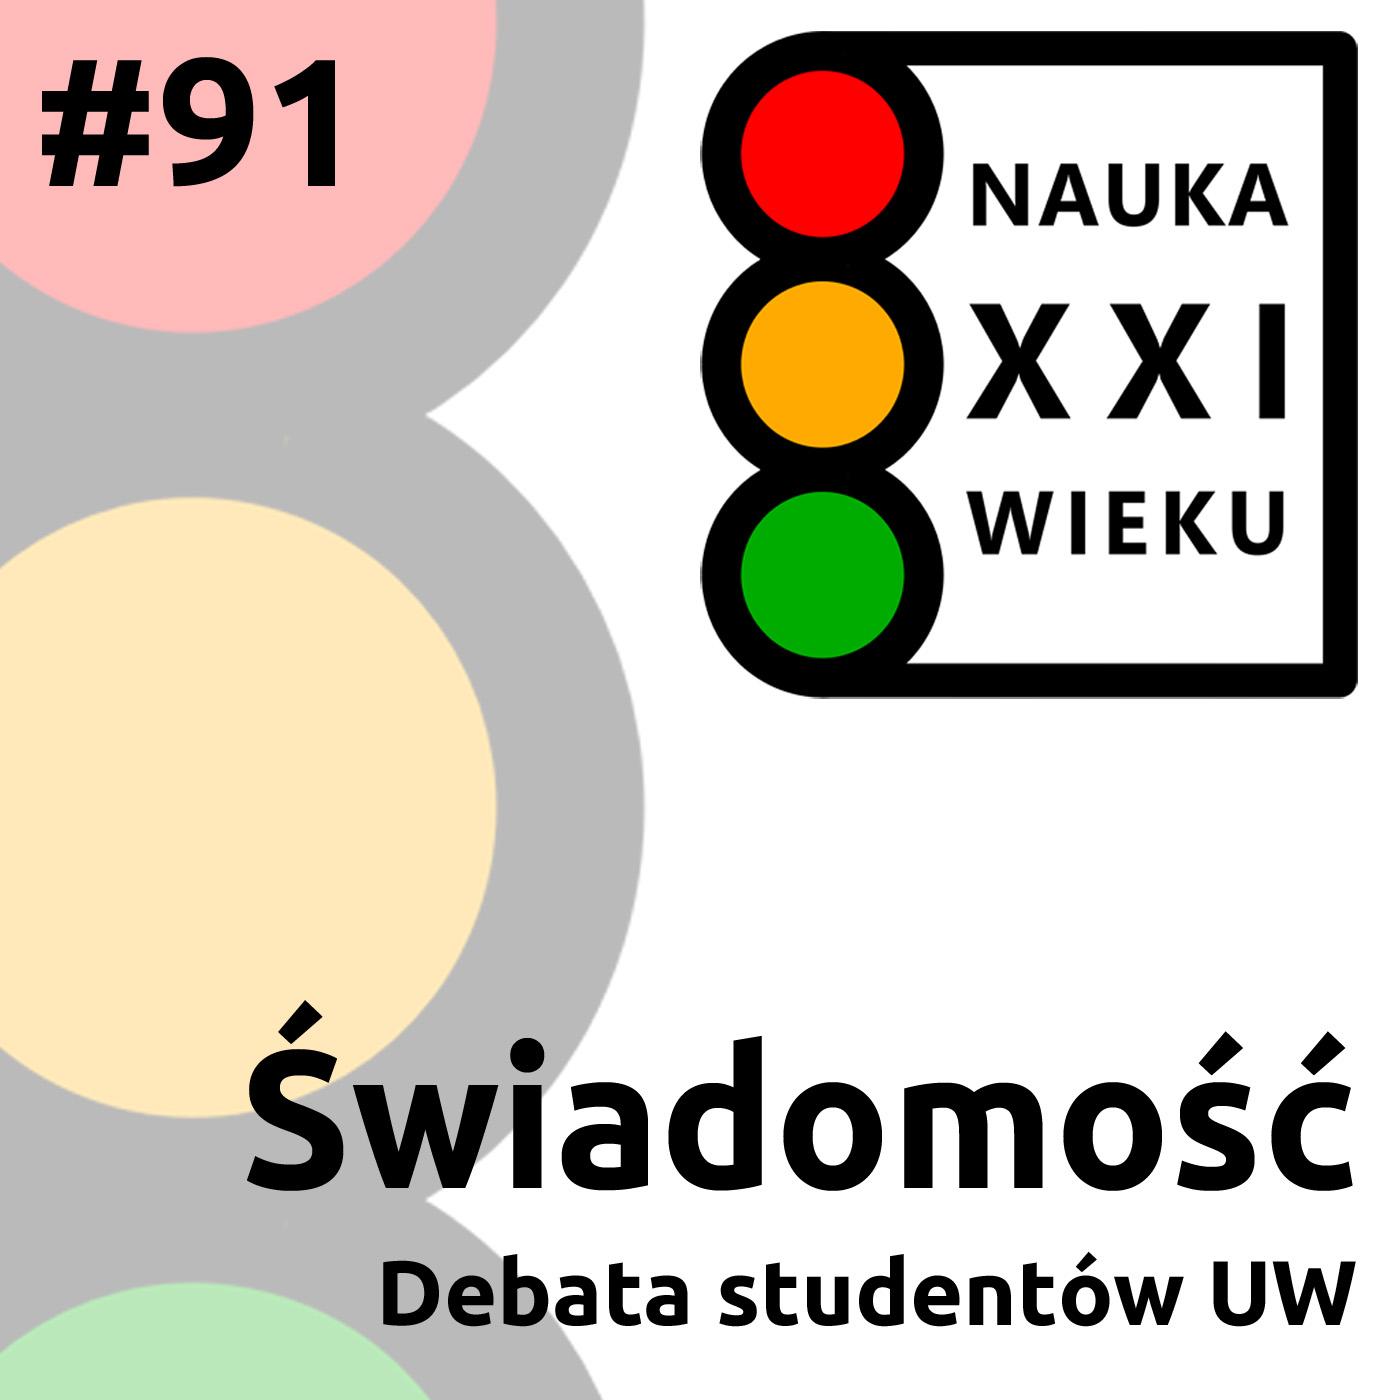 #91 - Świadomość, debata studentów UW